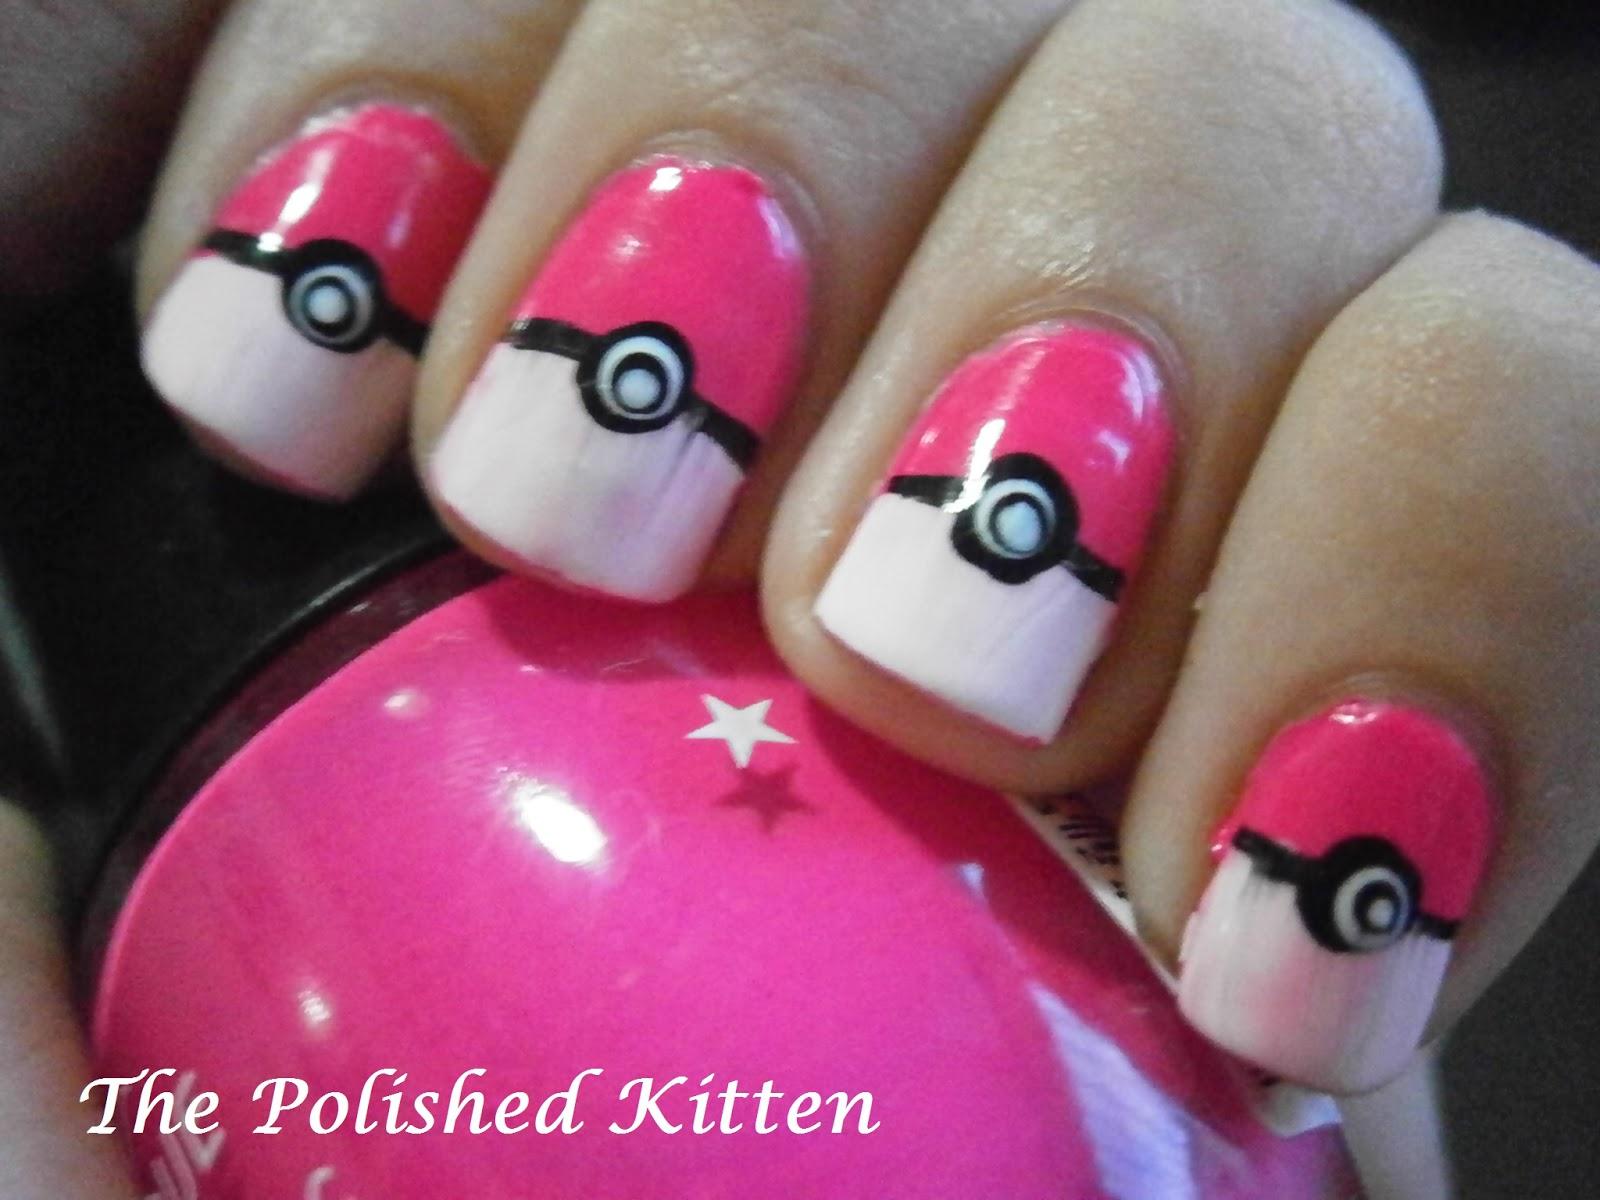 The Polished Kitten: pokeball nail art